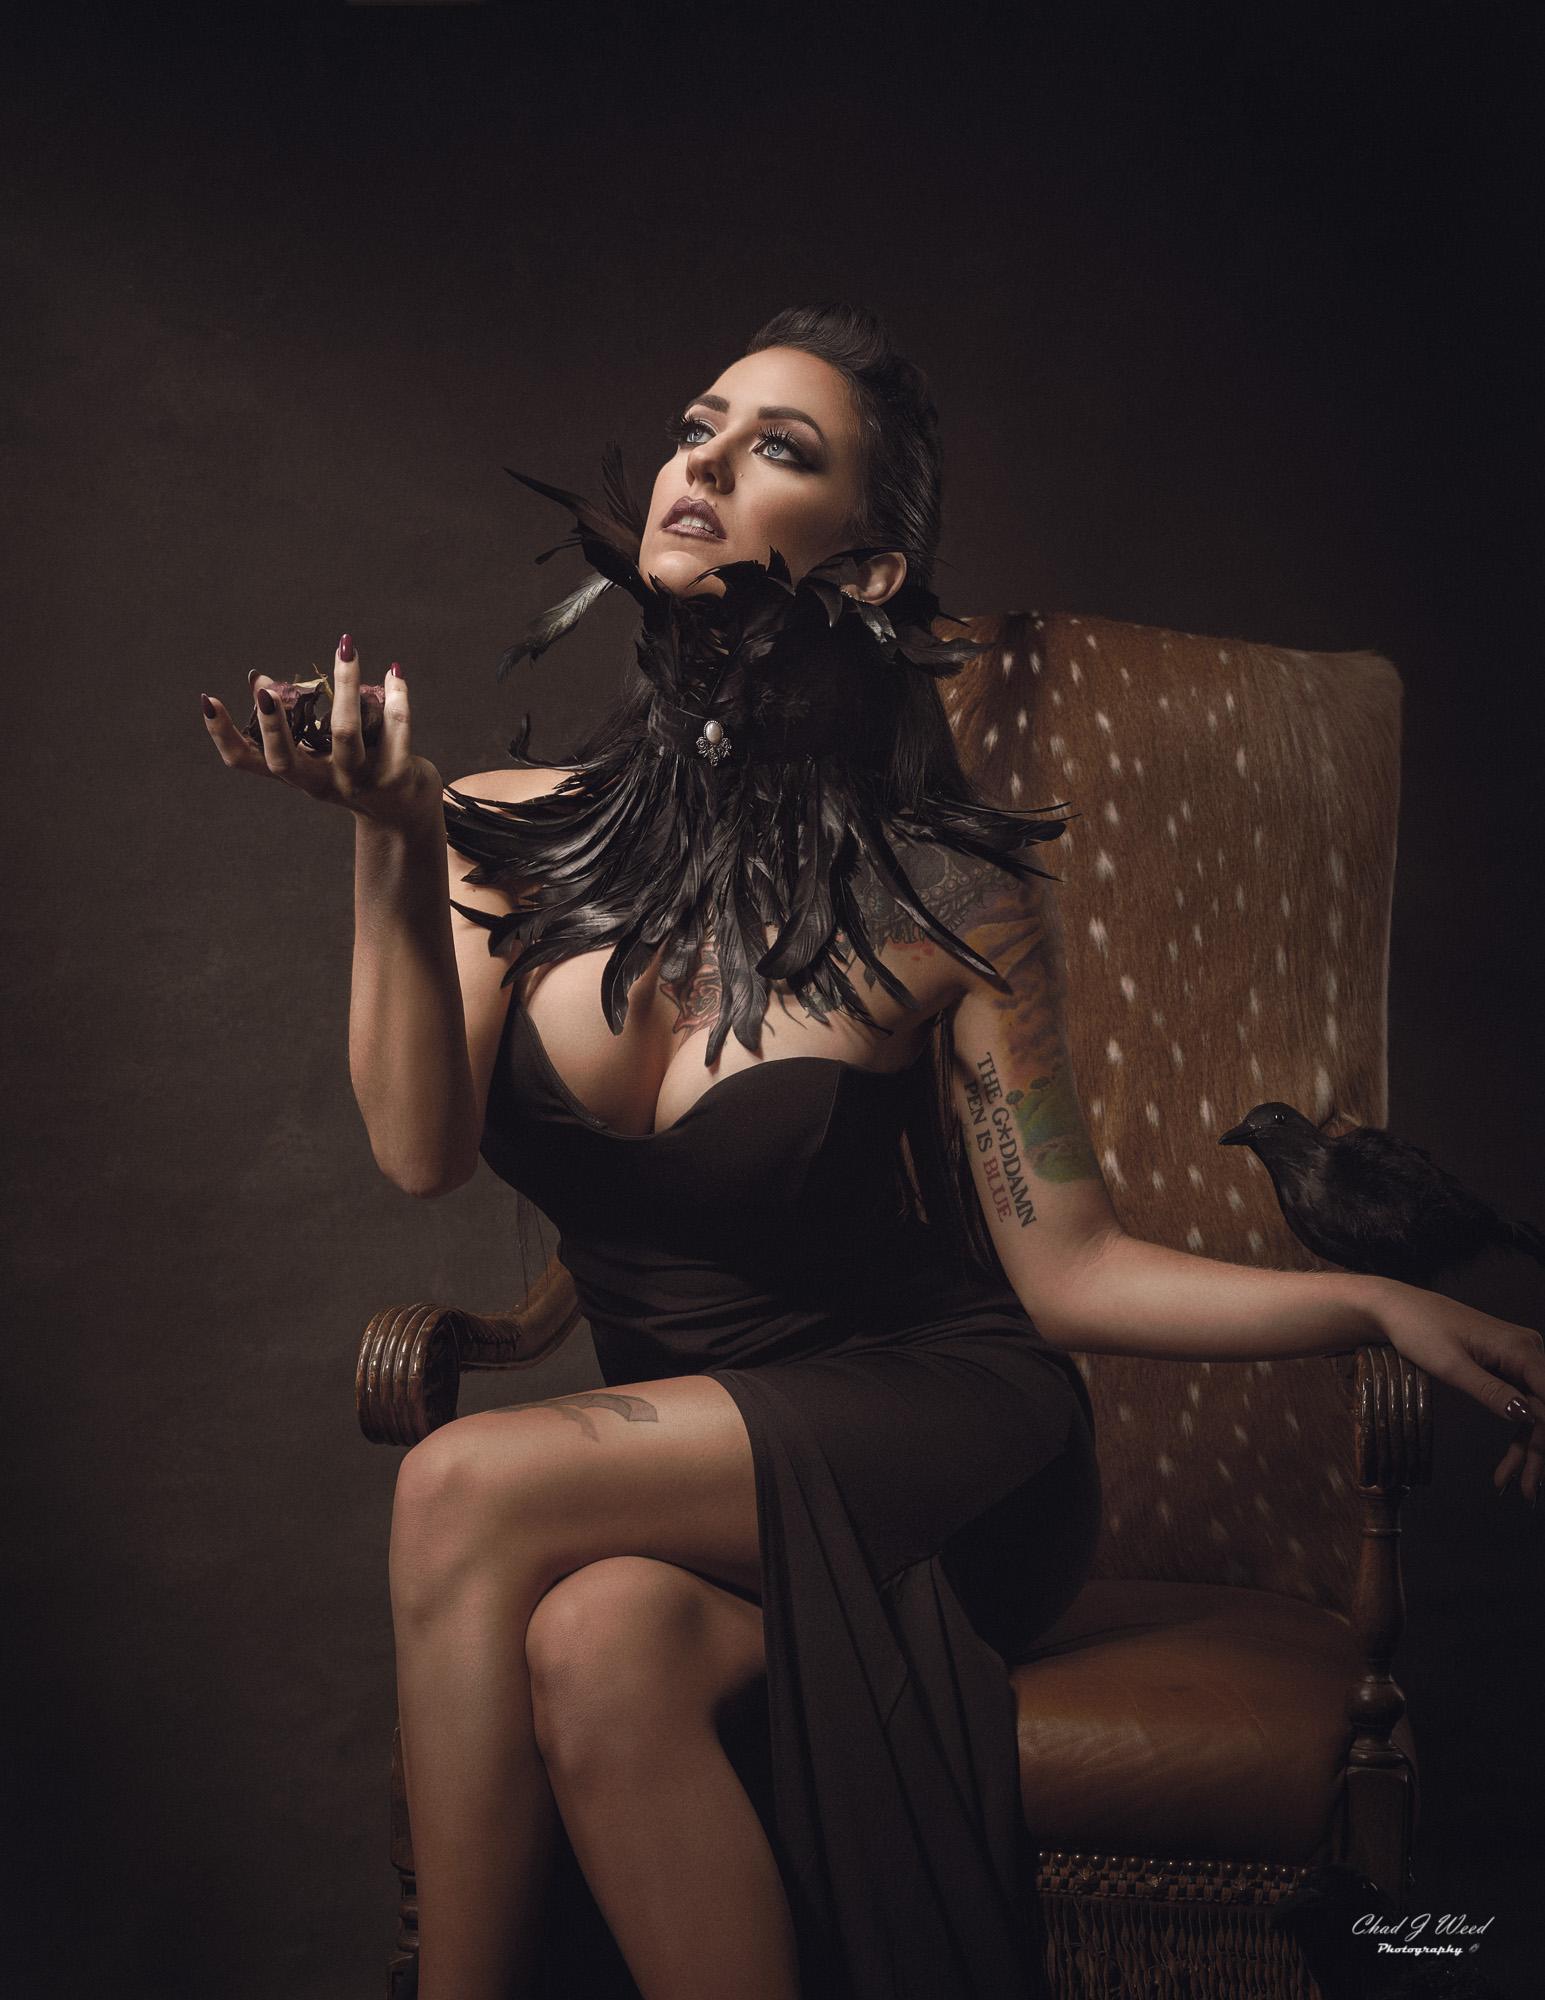 Halloween Theme with Fashion Model Lynda and Arizona Fashion Photographer Chad Weed